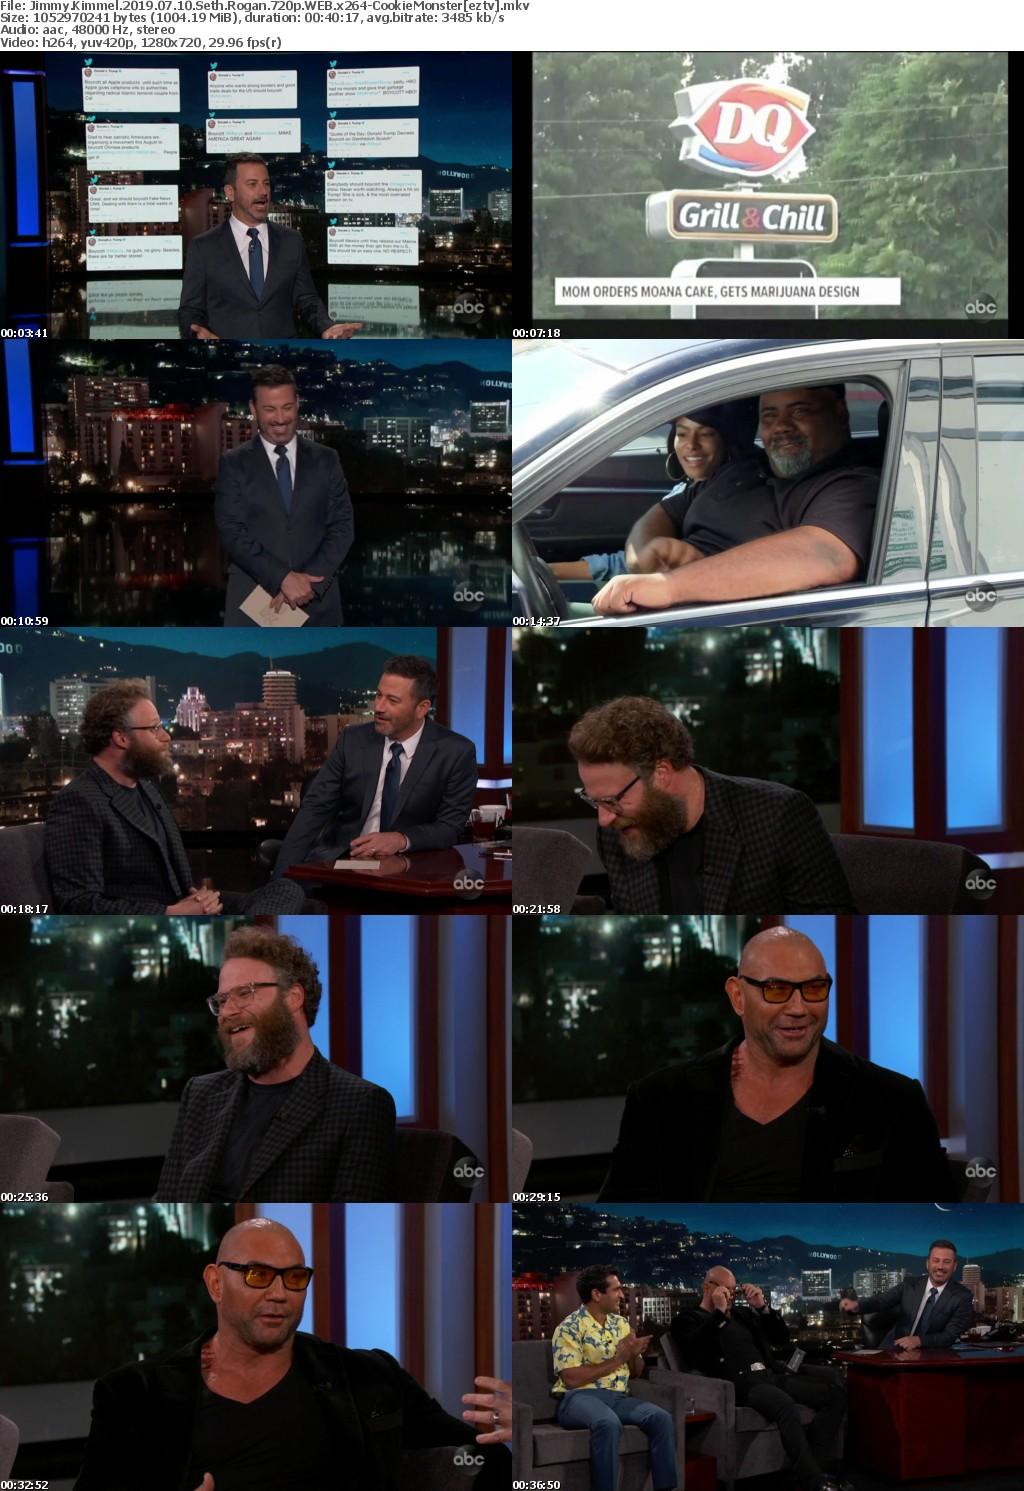 Jimmy Kimmel 2019 07 10 Seth Rogan 720p WEB x264 CookieMonster